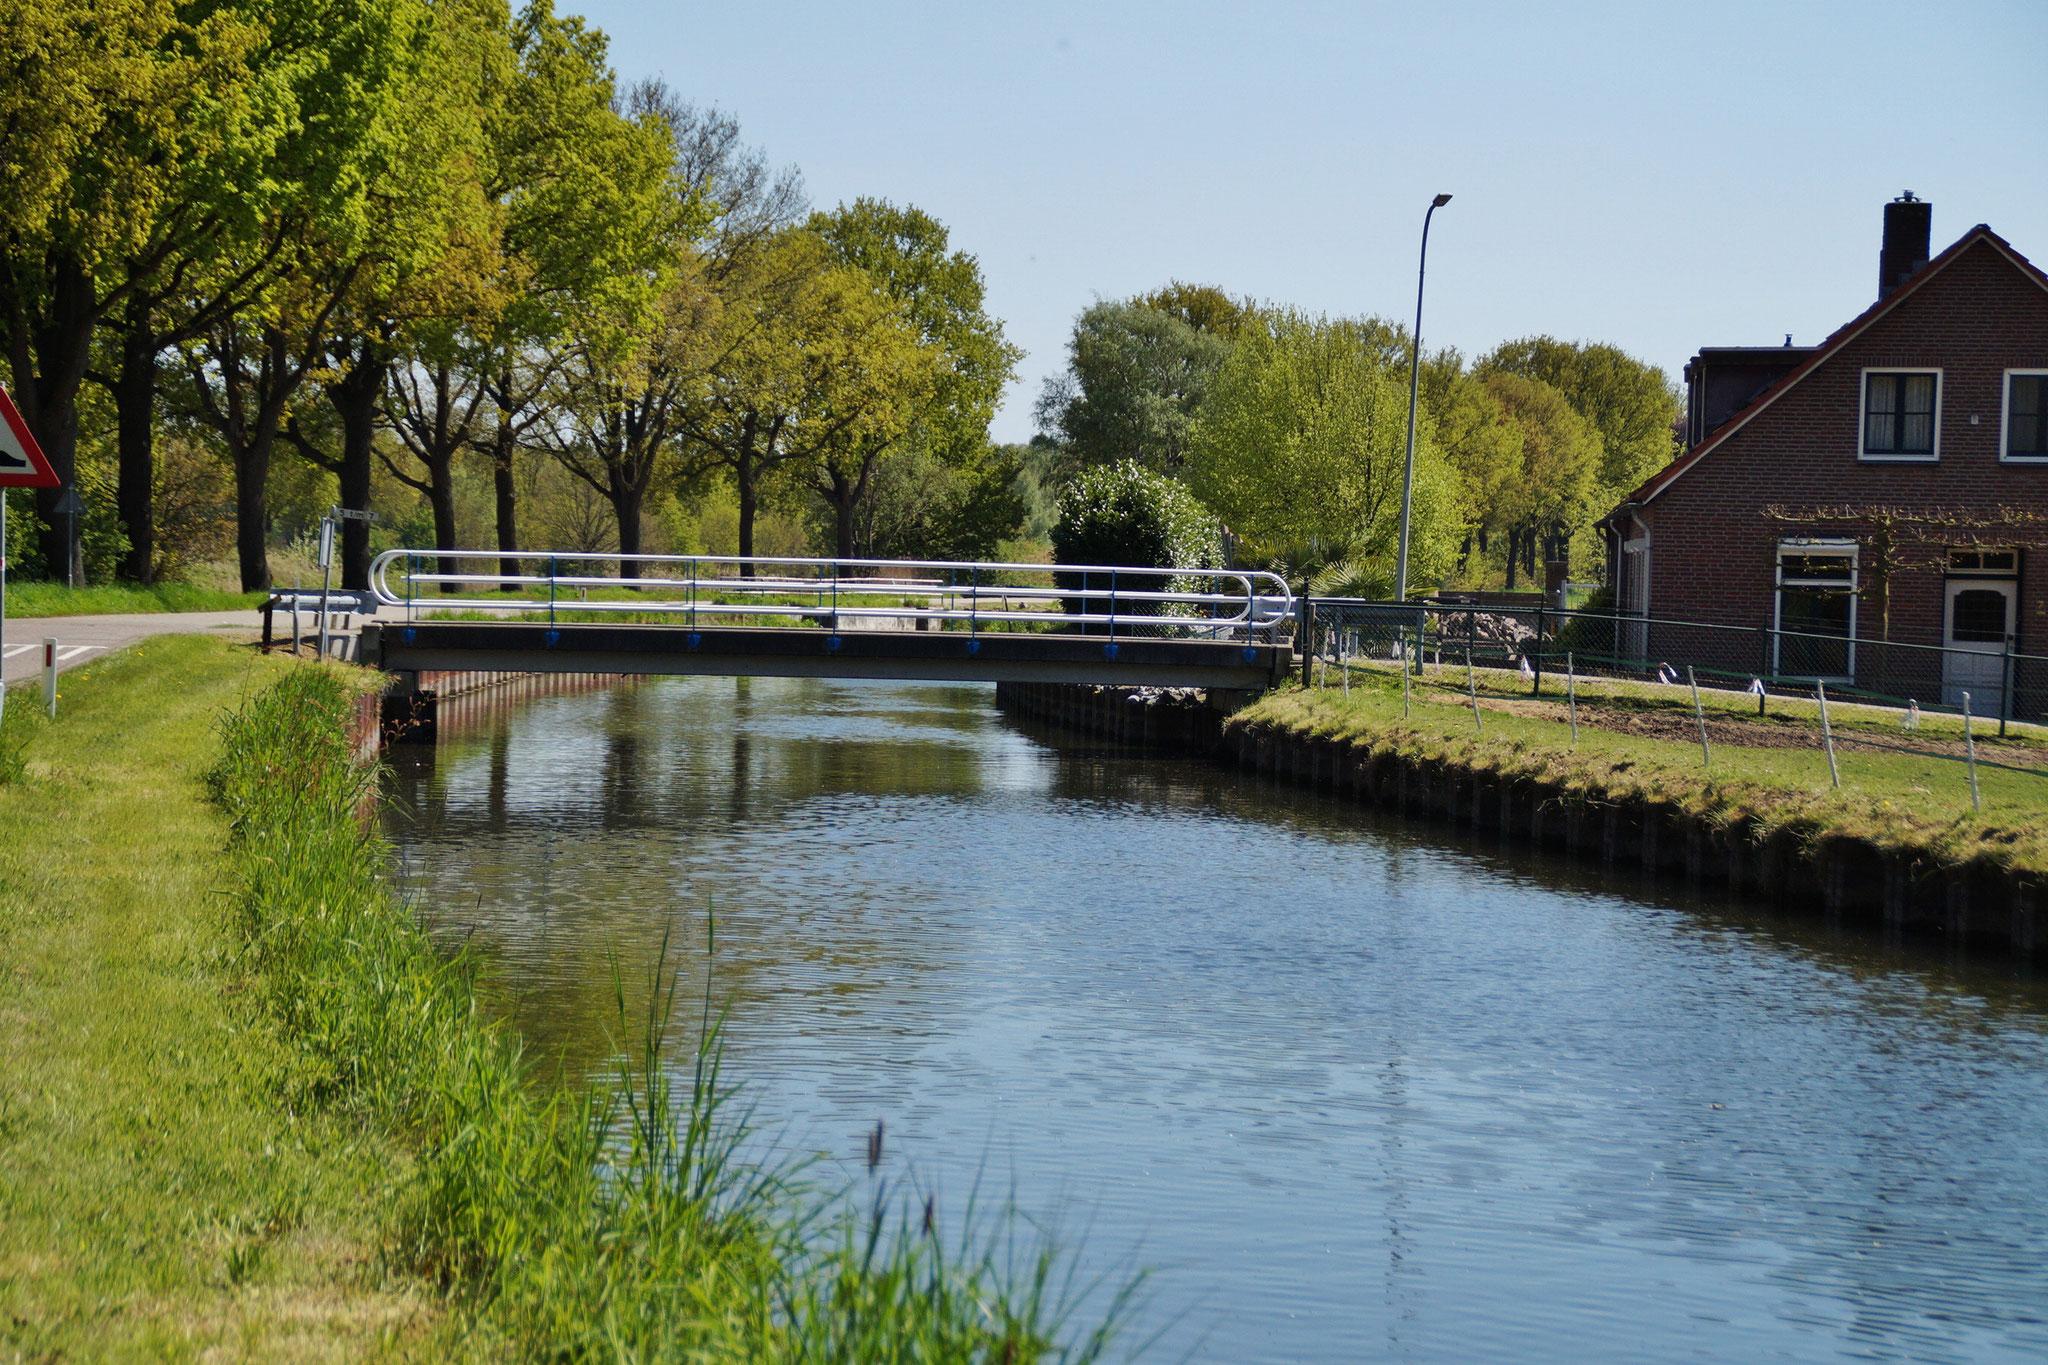 Am Wessem-Nederweert-Kanal